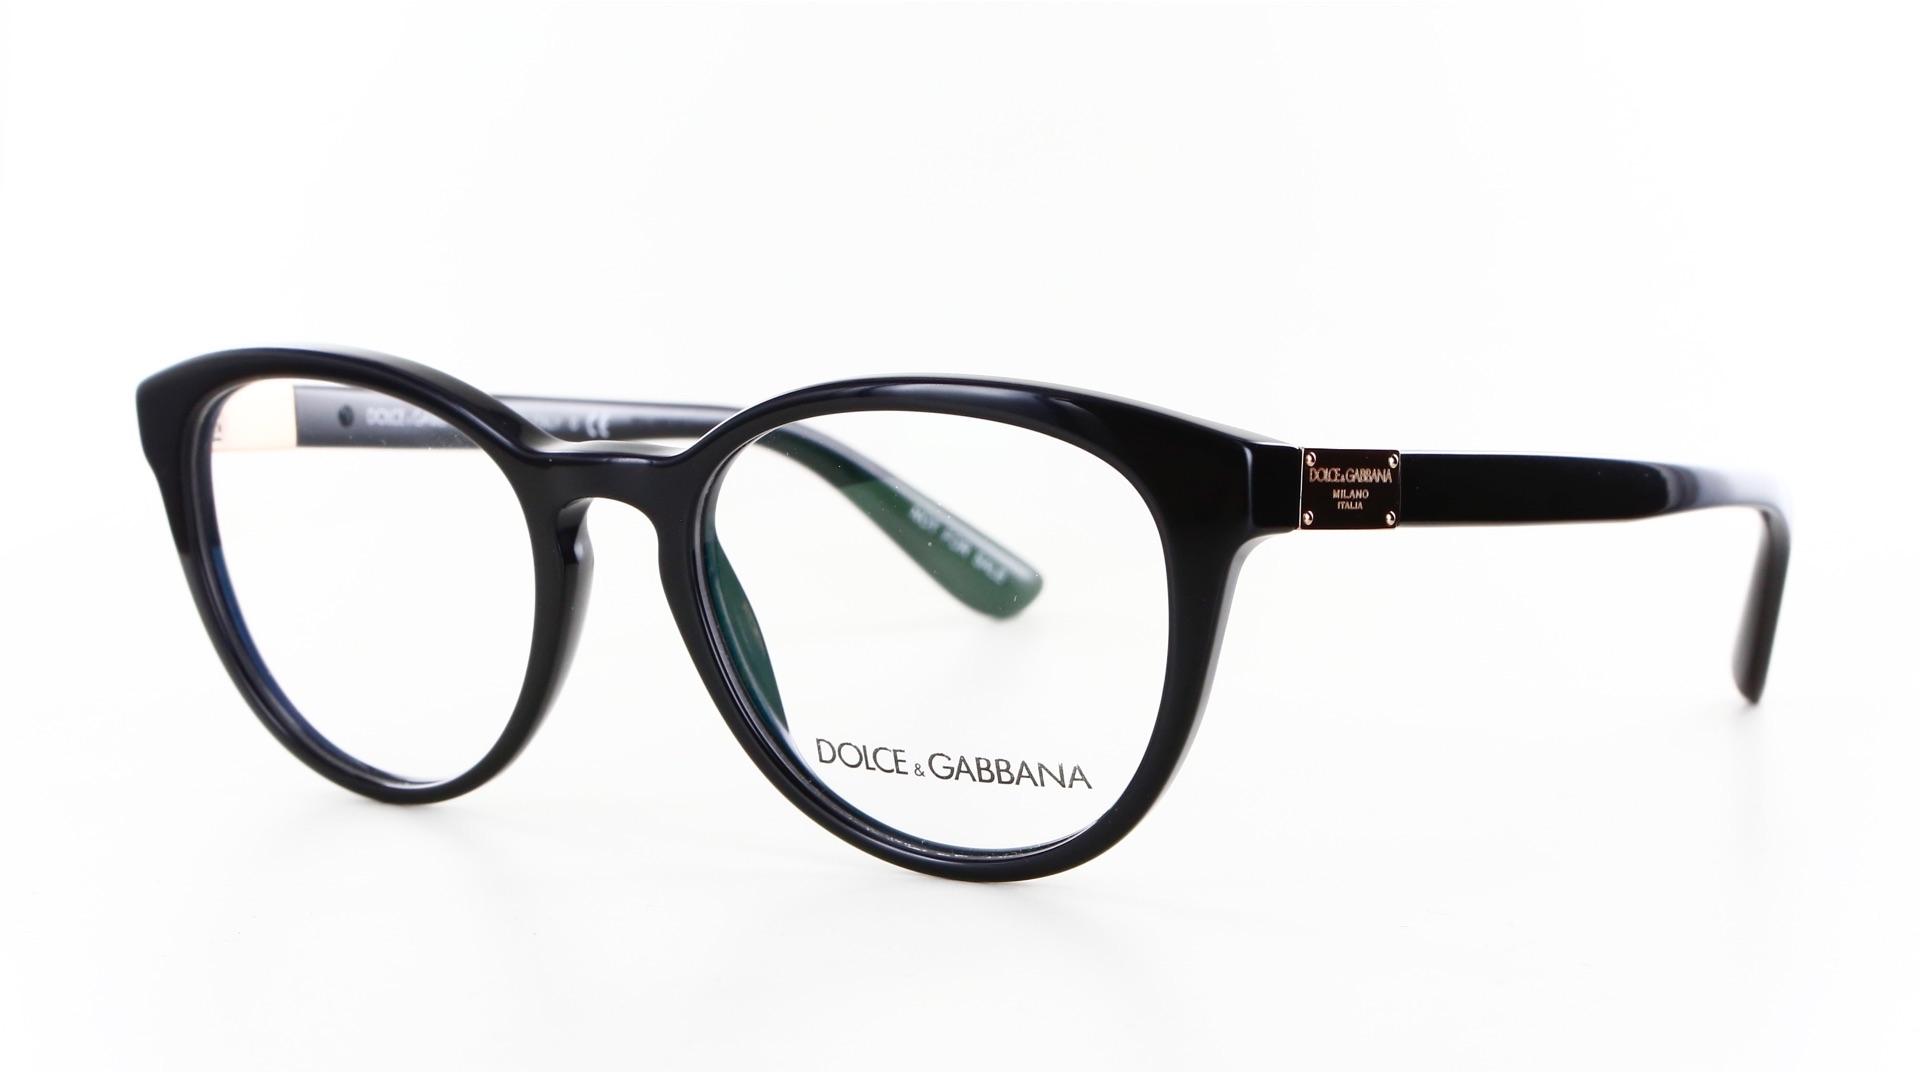 Dolce & Gabbana - ref: 77741